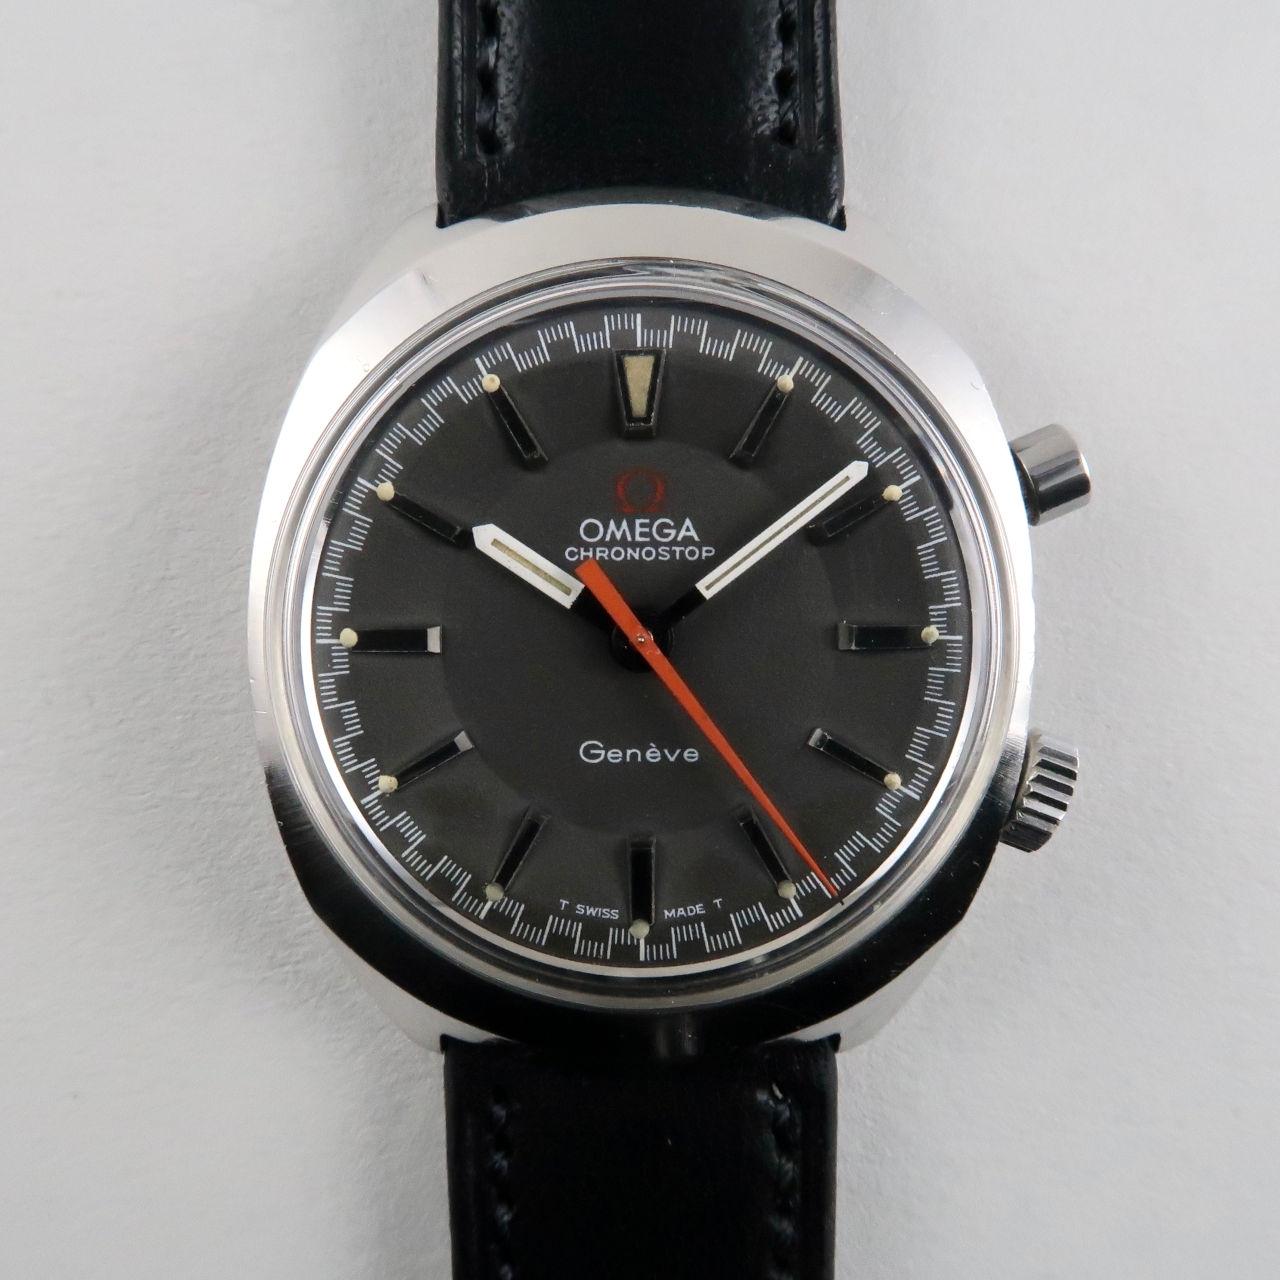 Omega Chronostop Ref. 145.009 steel vintage wristwatch, circa 1968